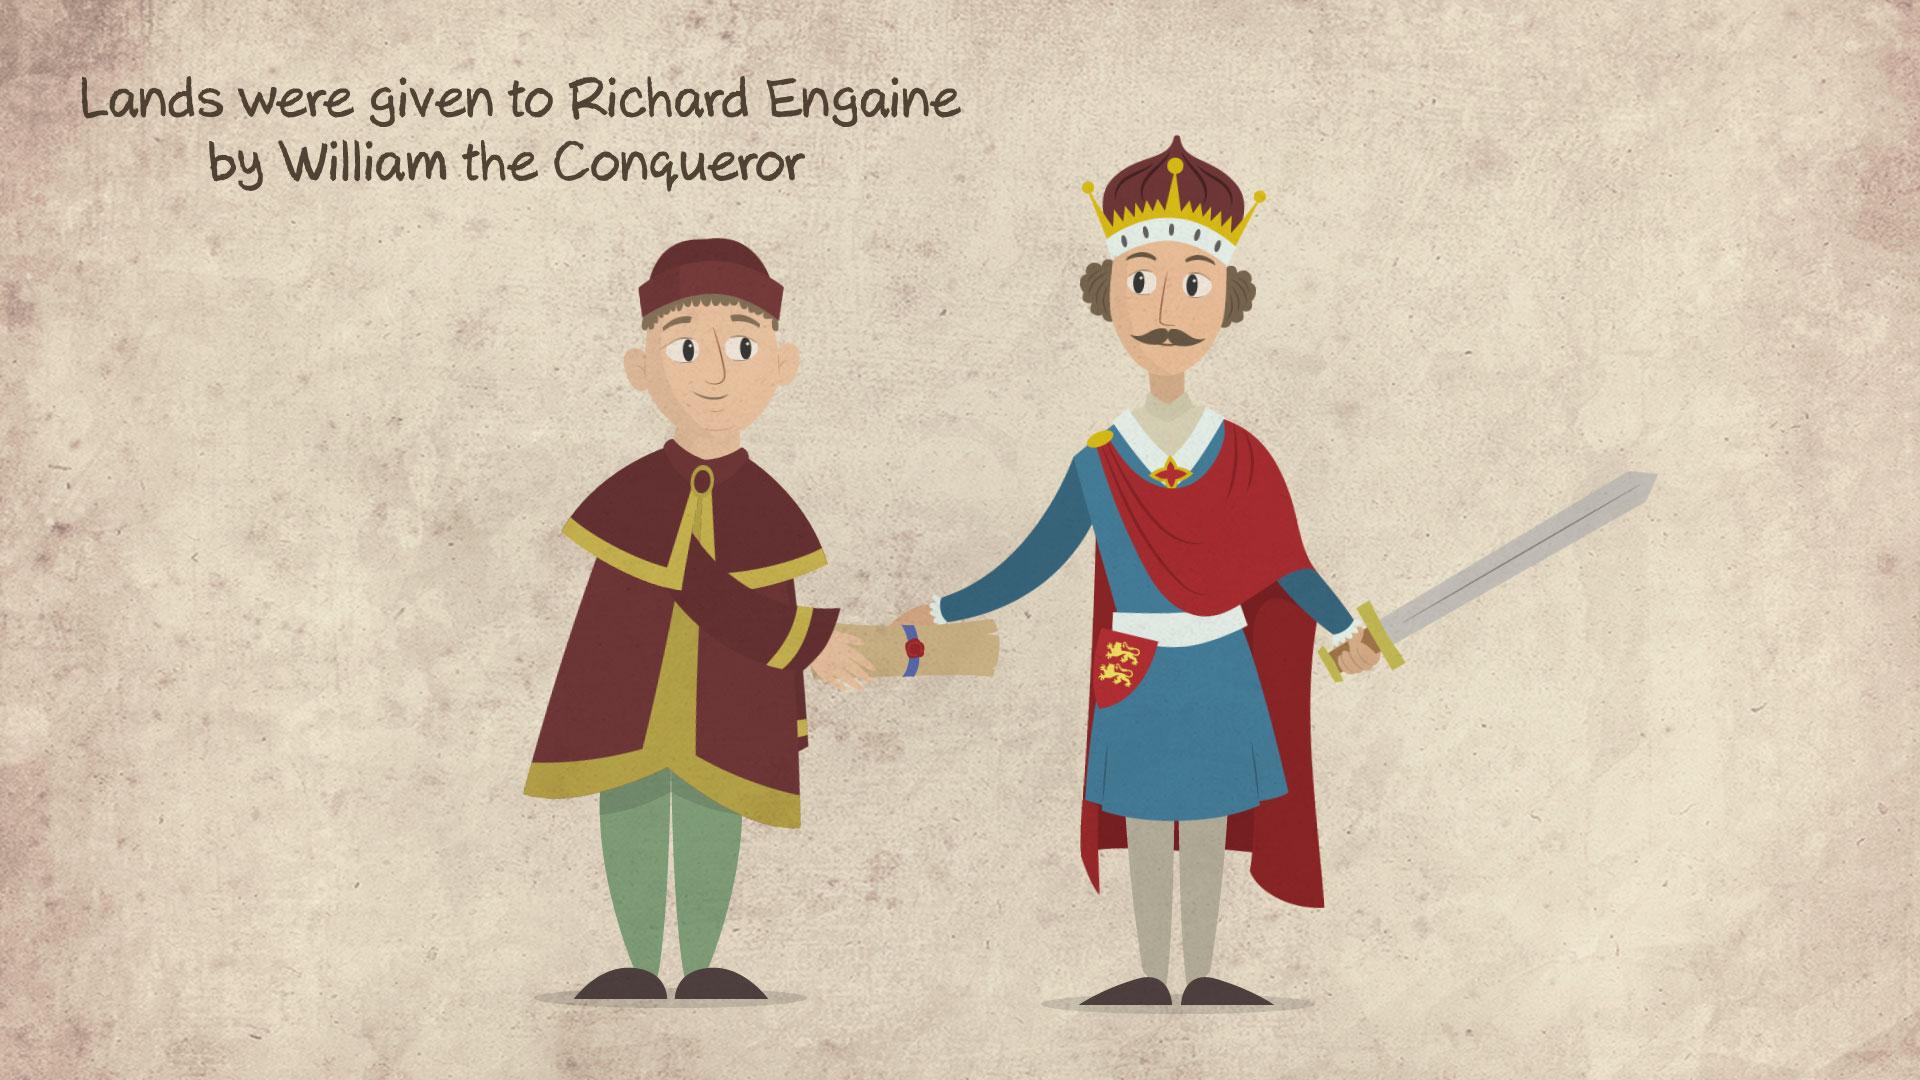 abington_william_the_conqueror.jpg